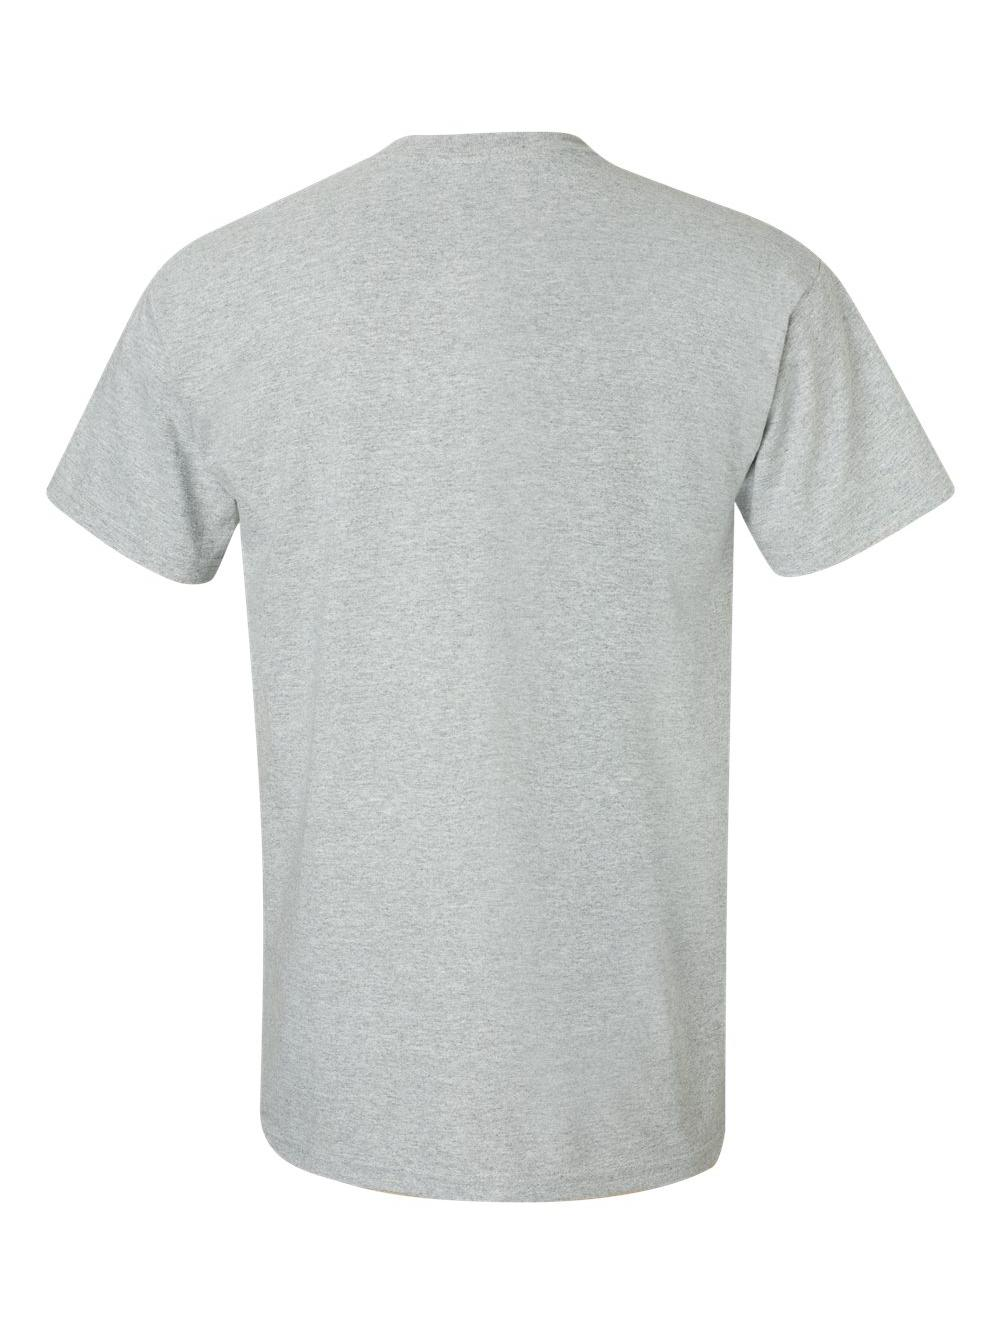 Gildan-Ultra-Cotton-T-Shirt-with-a-Pocket-2300 thumbnail 43